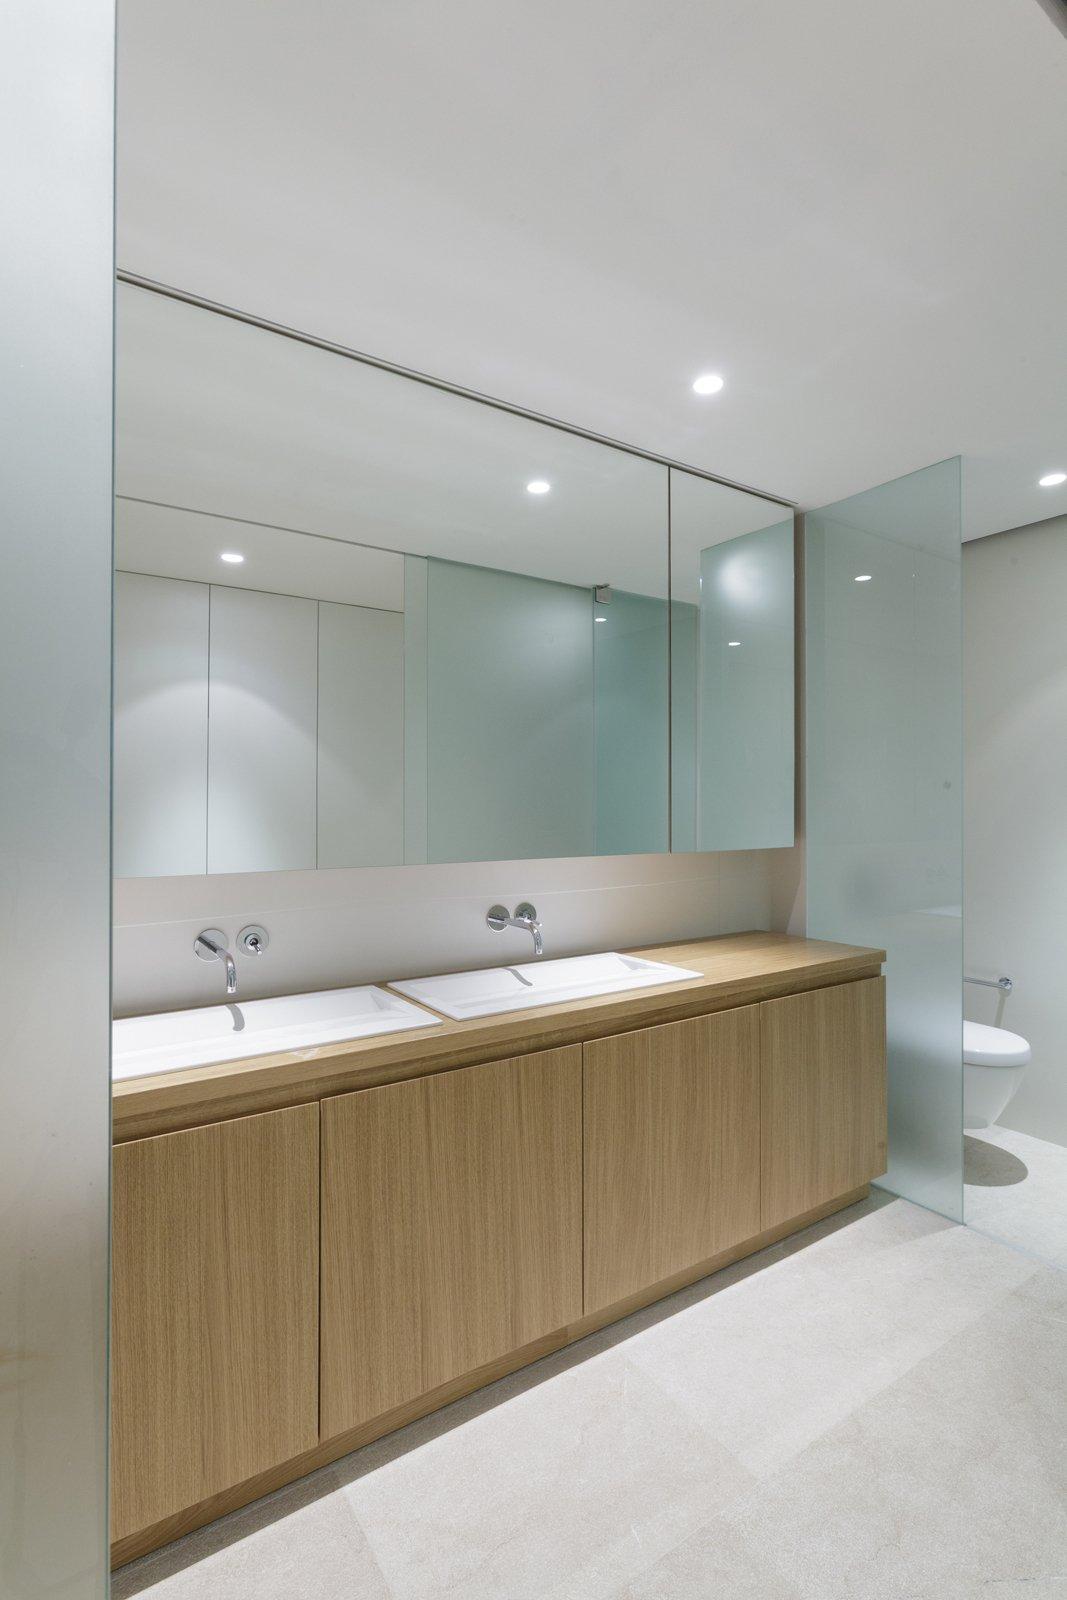 Bathroom, Double Sinks, House in Dubrovnik, Croatia